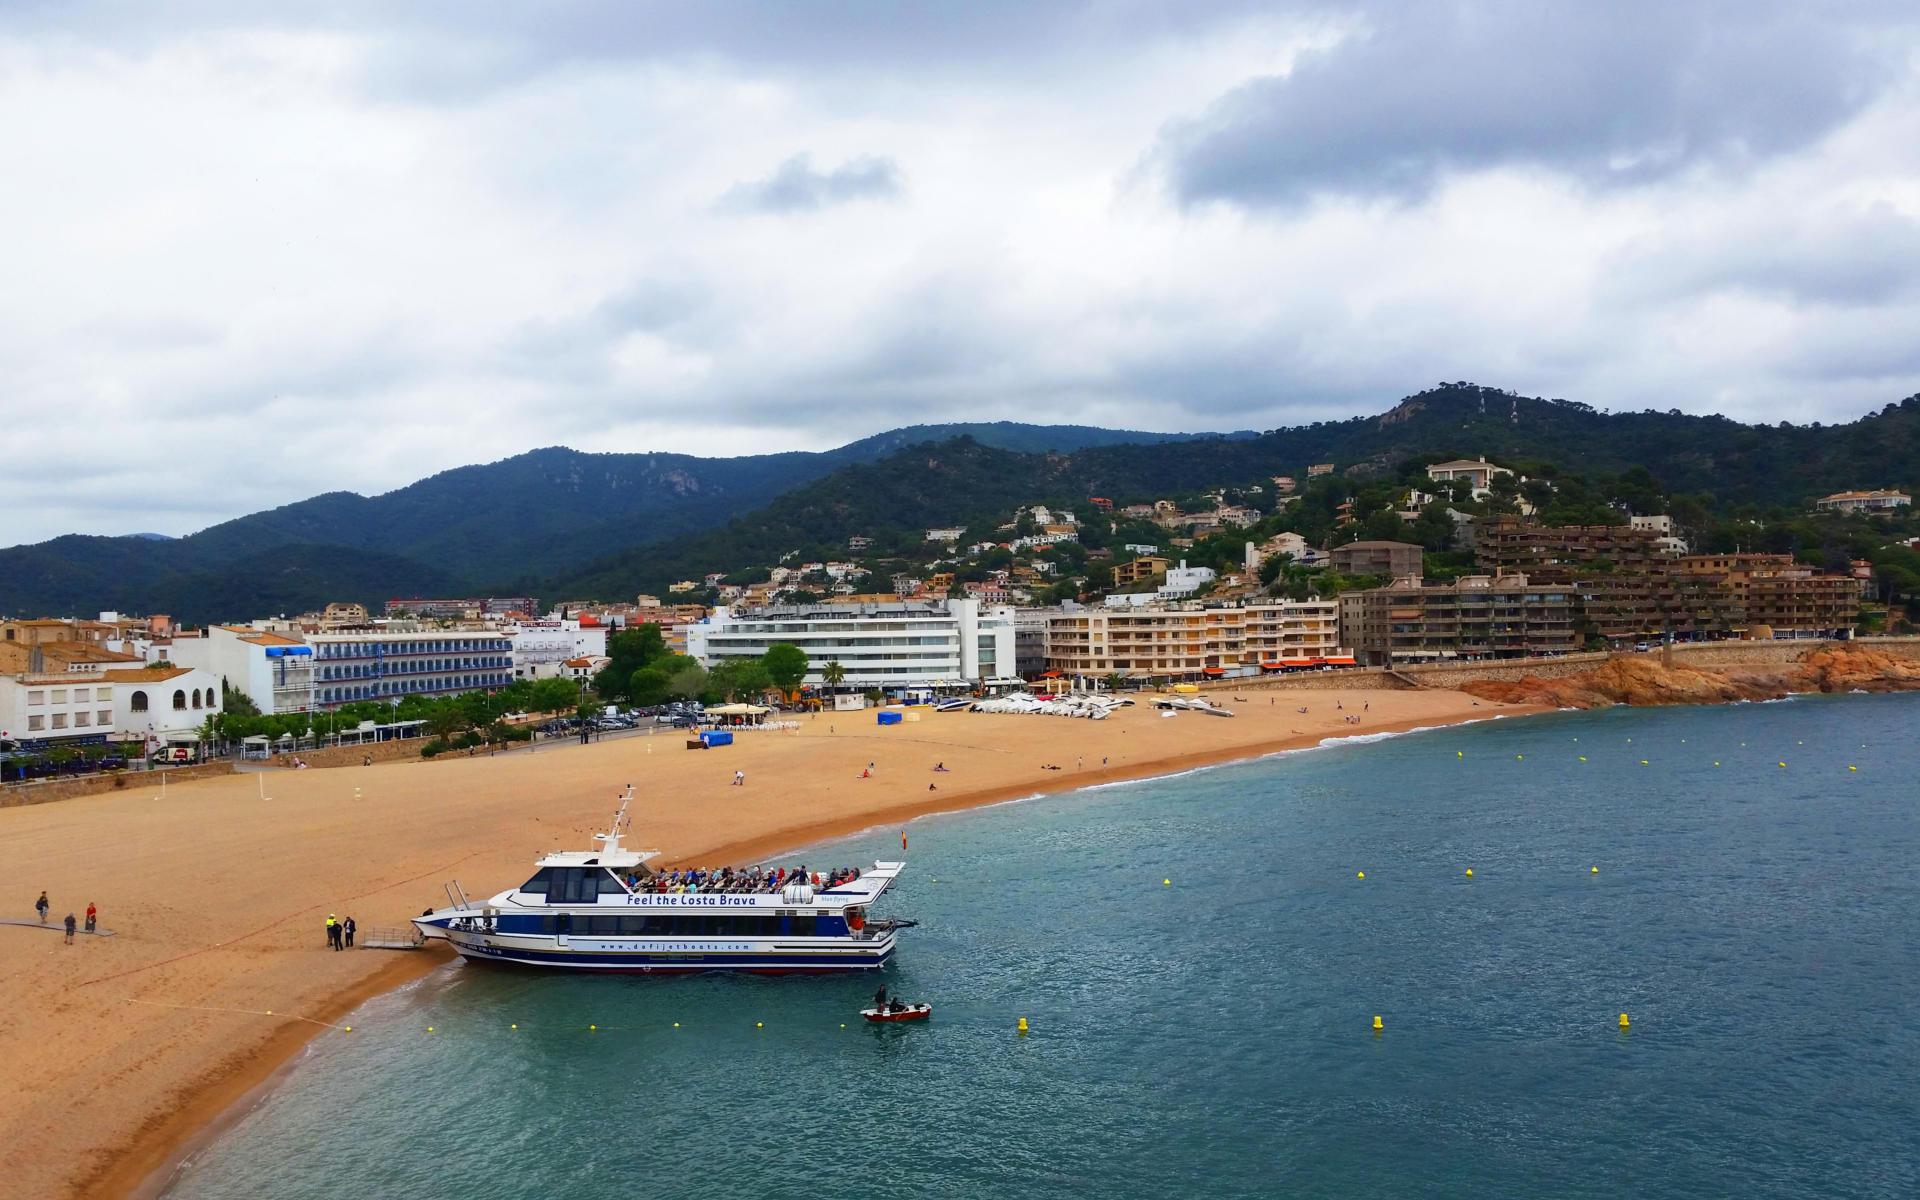 Photo Diary | Tossa de Mar, Spain